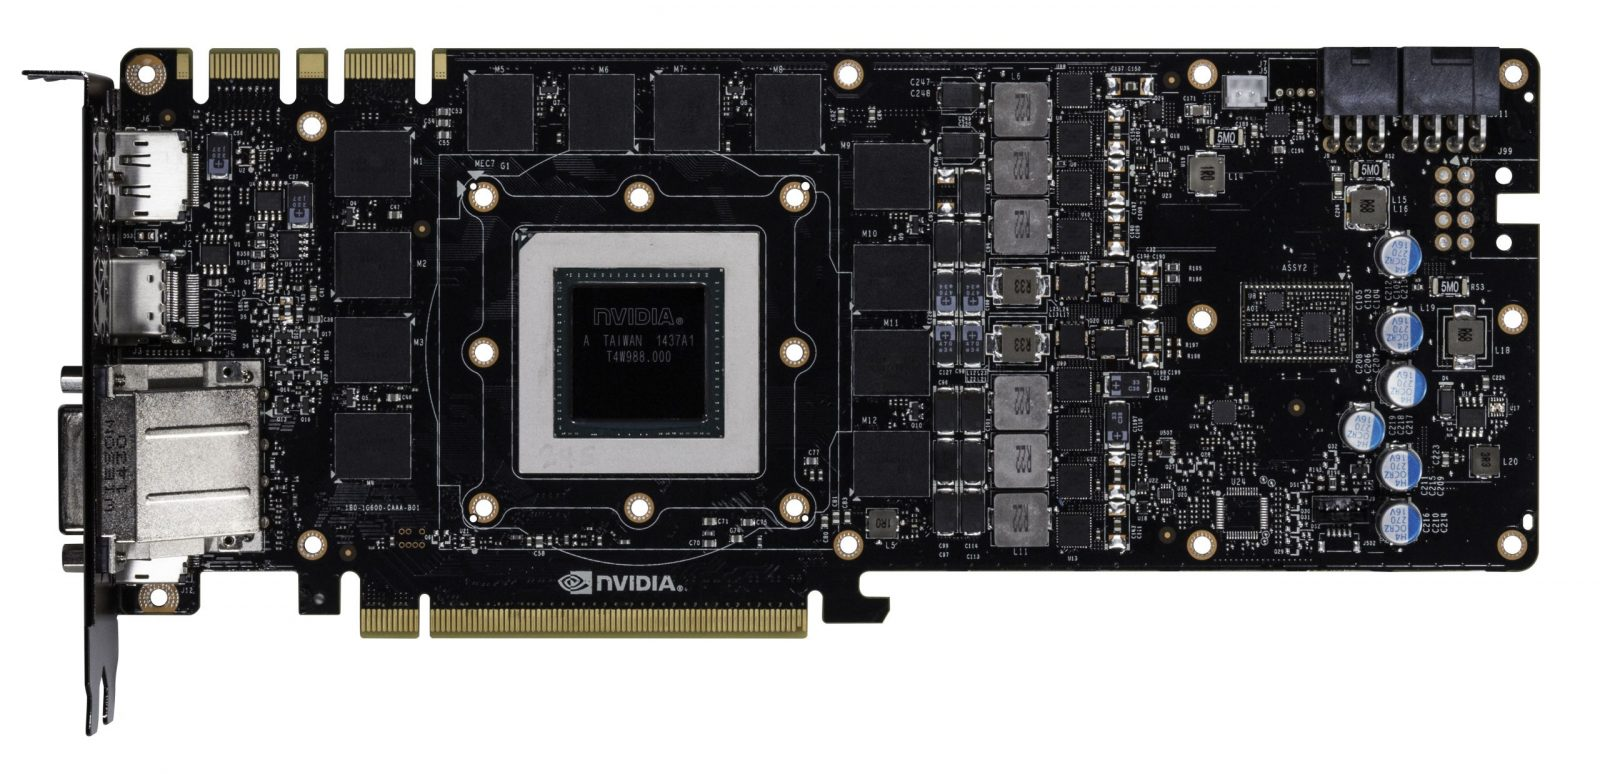 Nvidia Geforce Gtx 1080 Pcb Pictured Videocardz Com